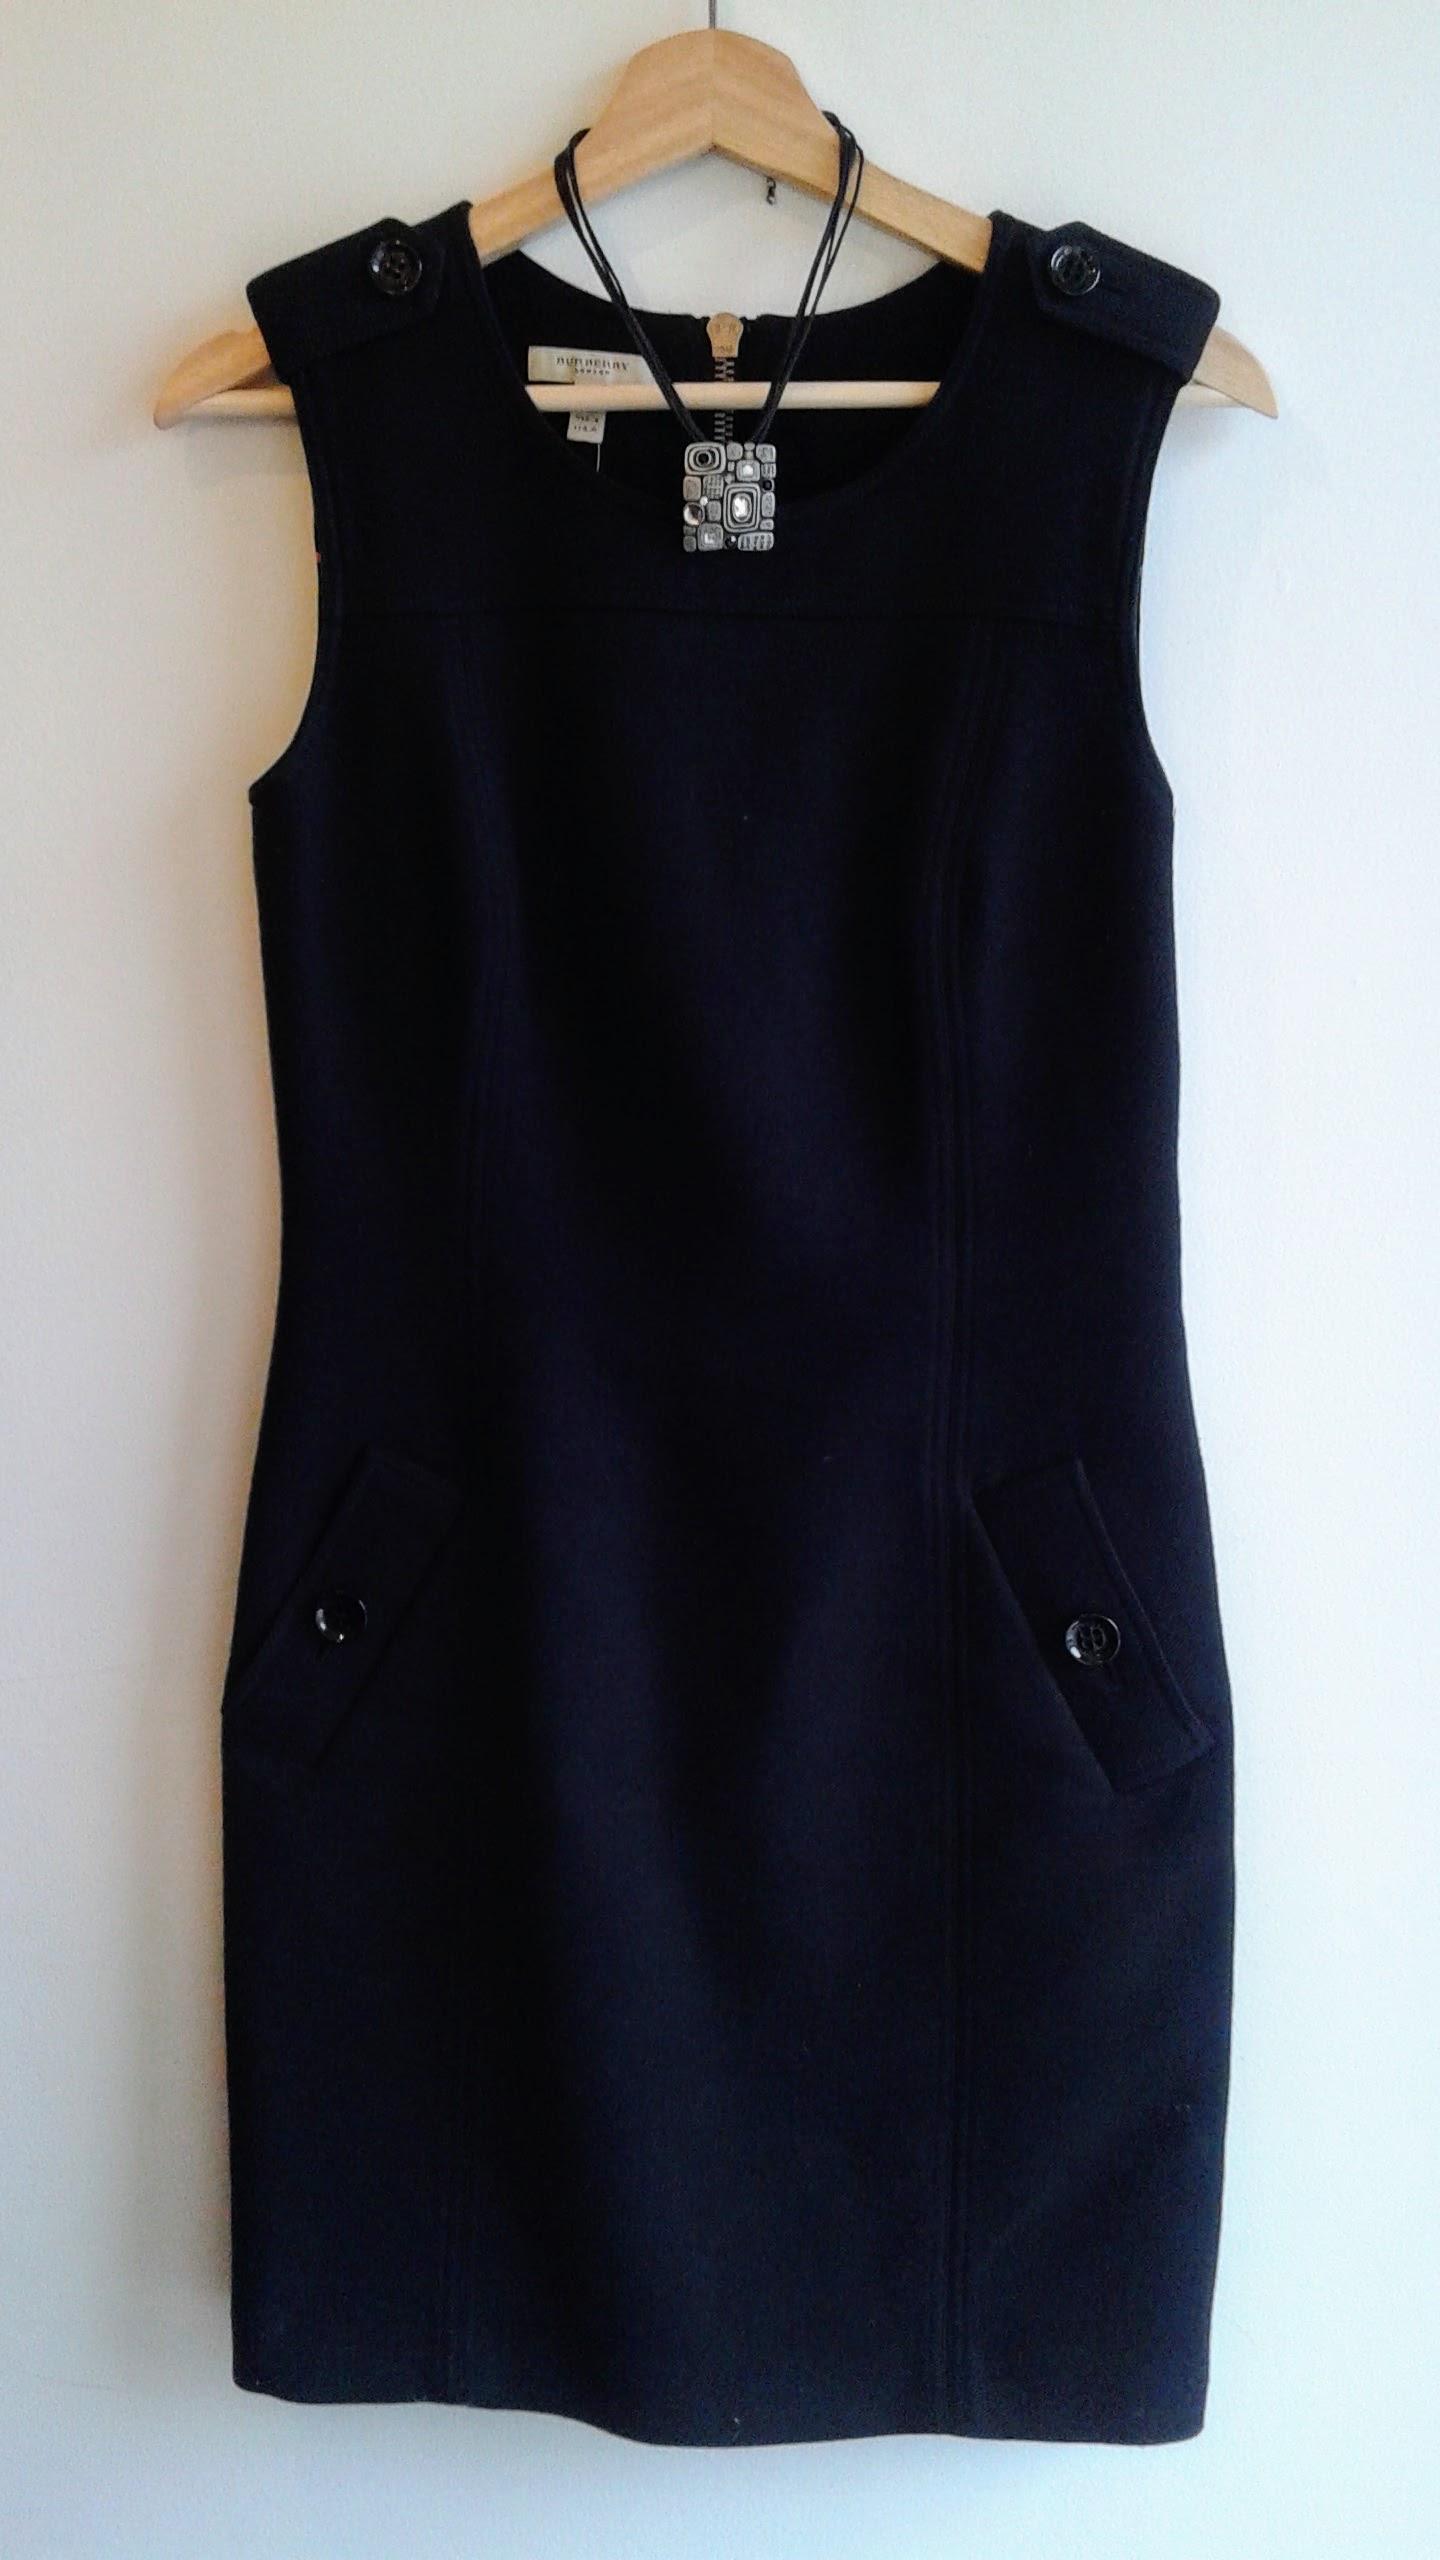 Burberry dress, S8, $150; Necklace, $16